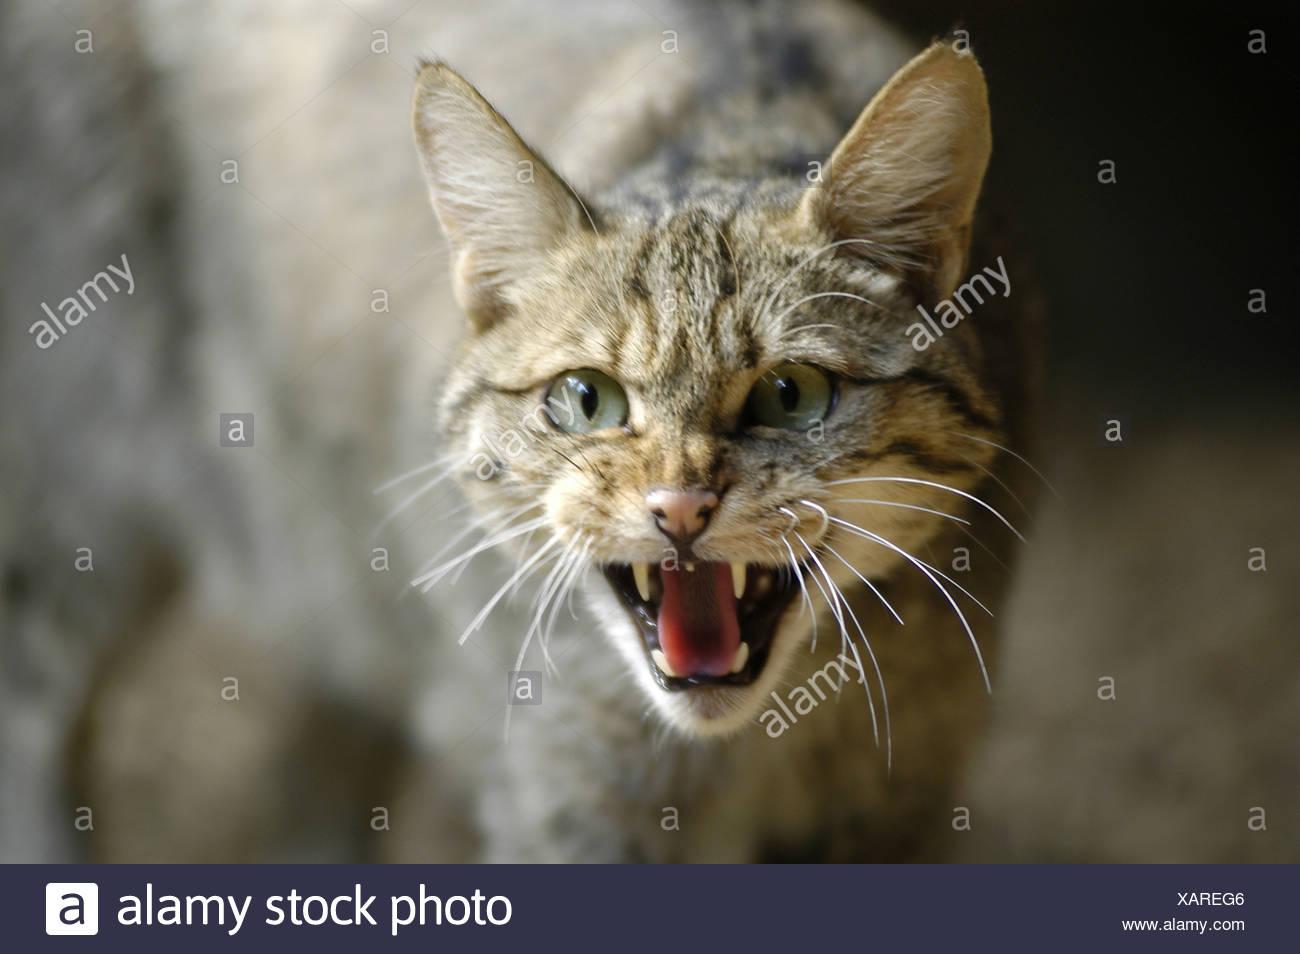 wild cat (Felis silvestris), snarling, captive, Germany, NP Bavarian Forest - Stock Image